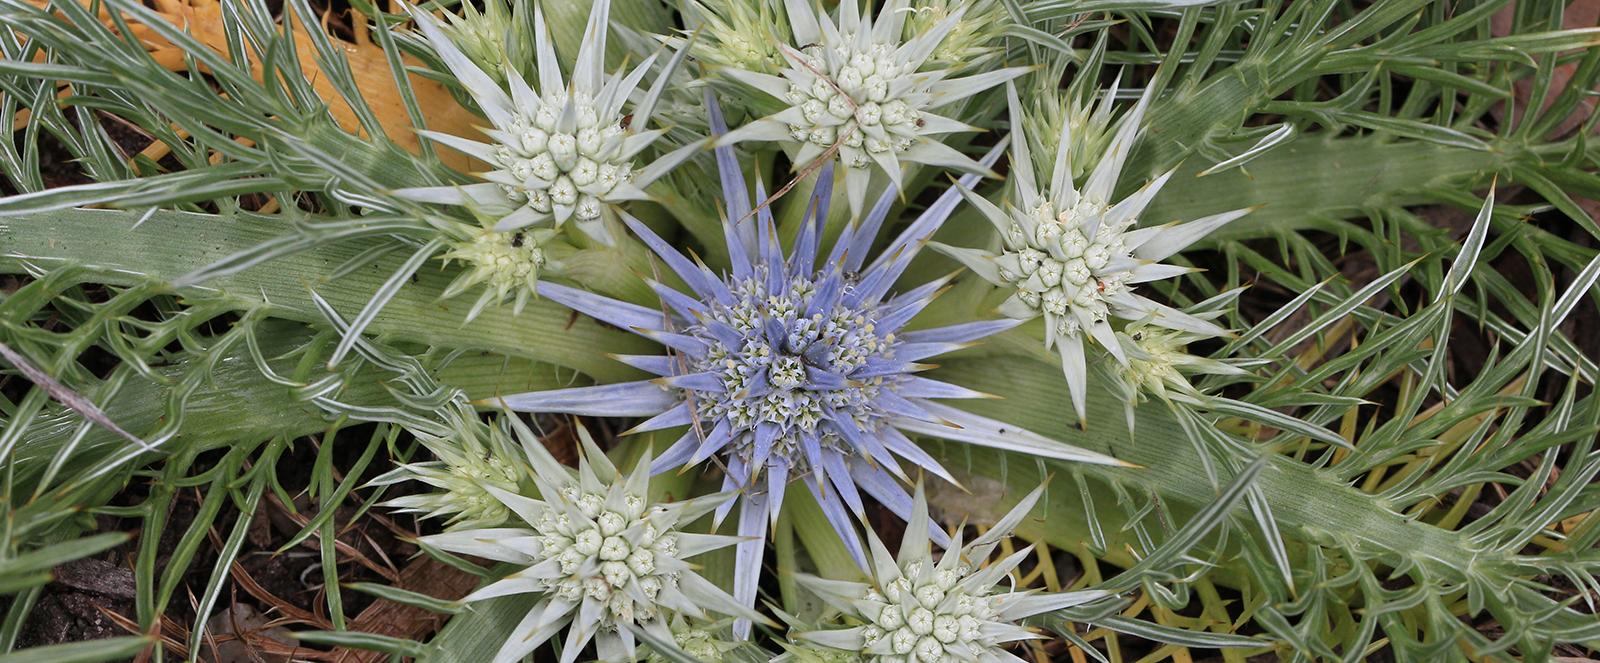 Eryngium-ovinum-Dave-Marrison-narrow-image-for-slider